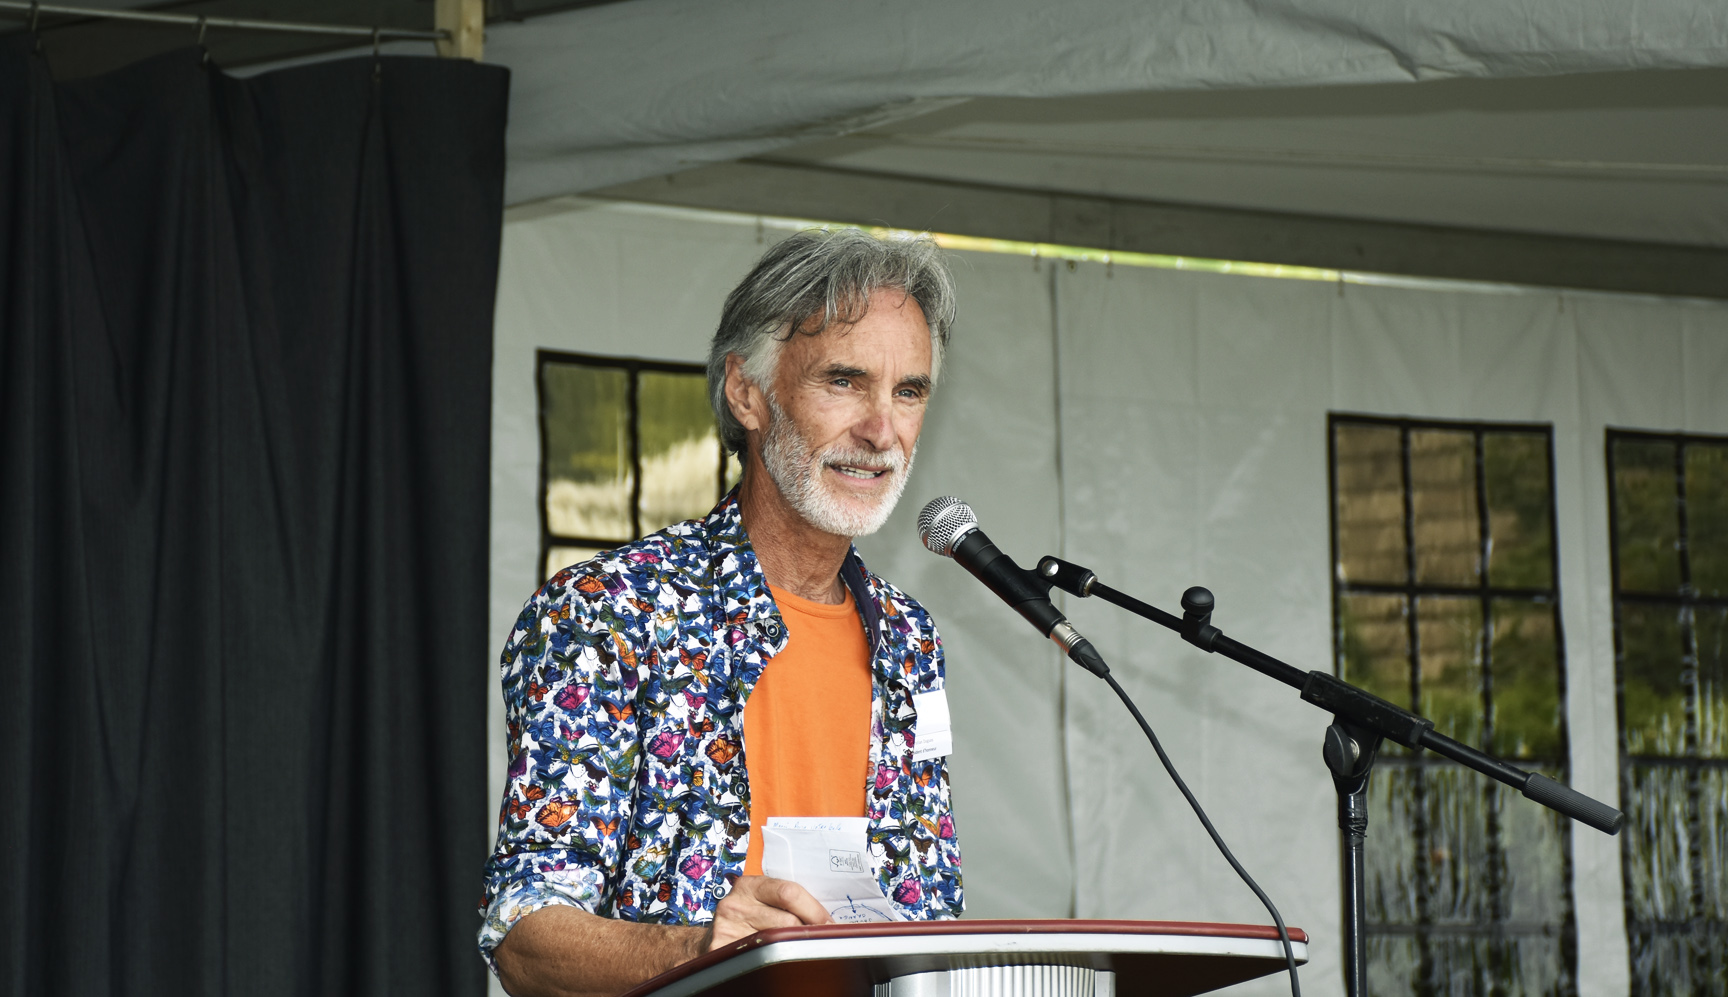 Christian Duguay